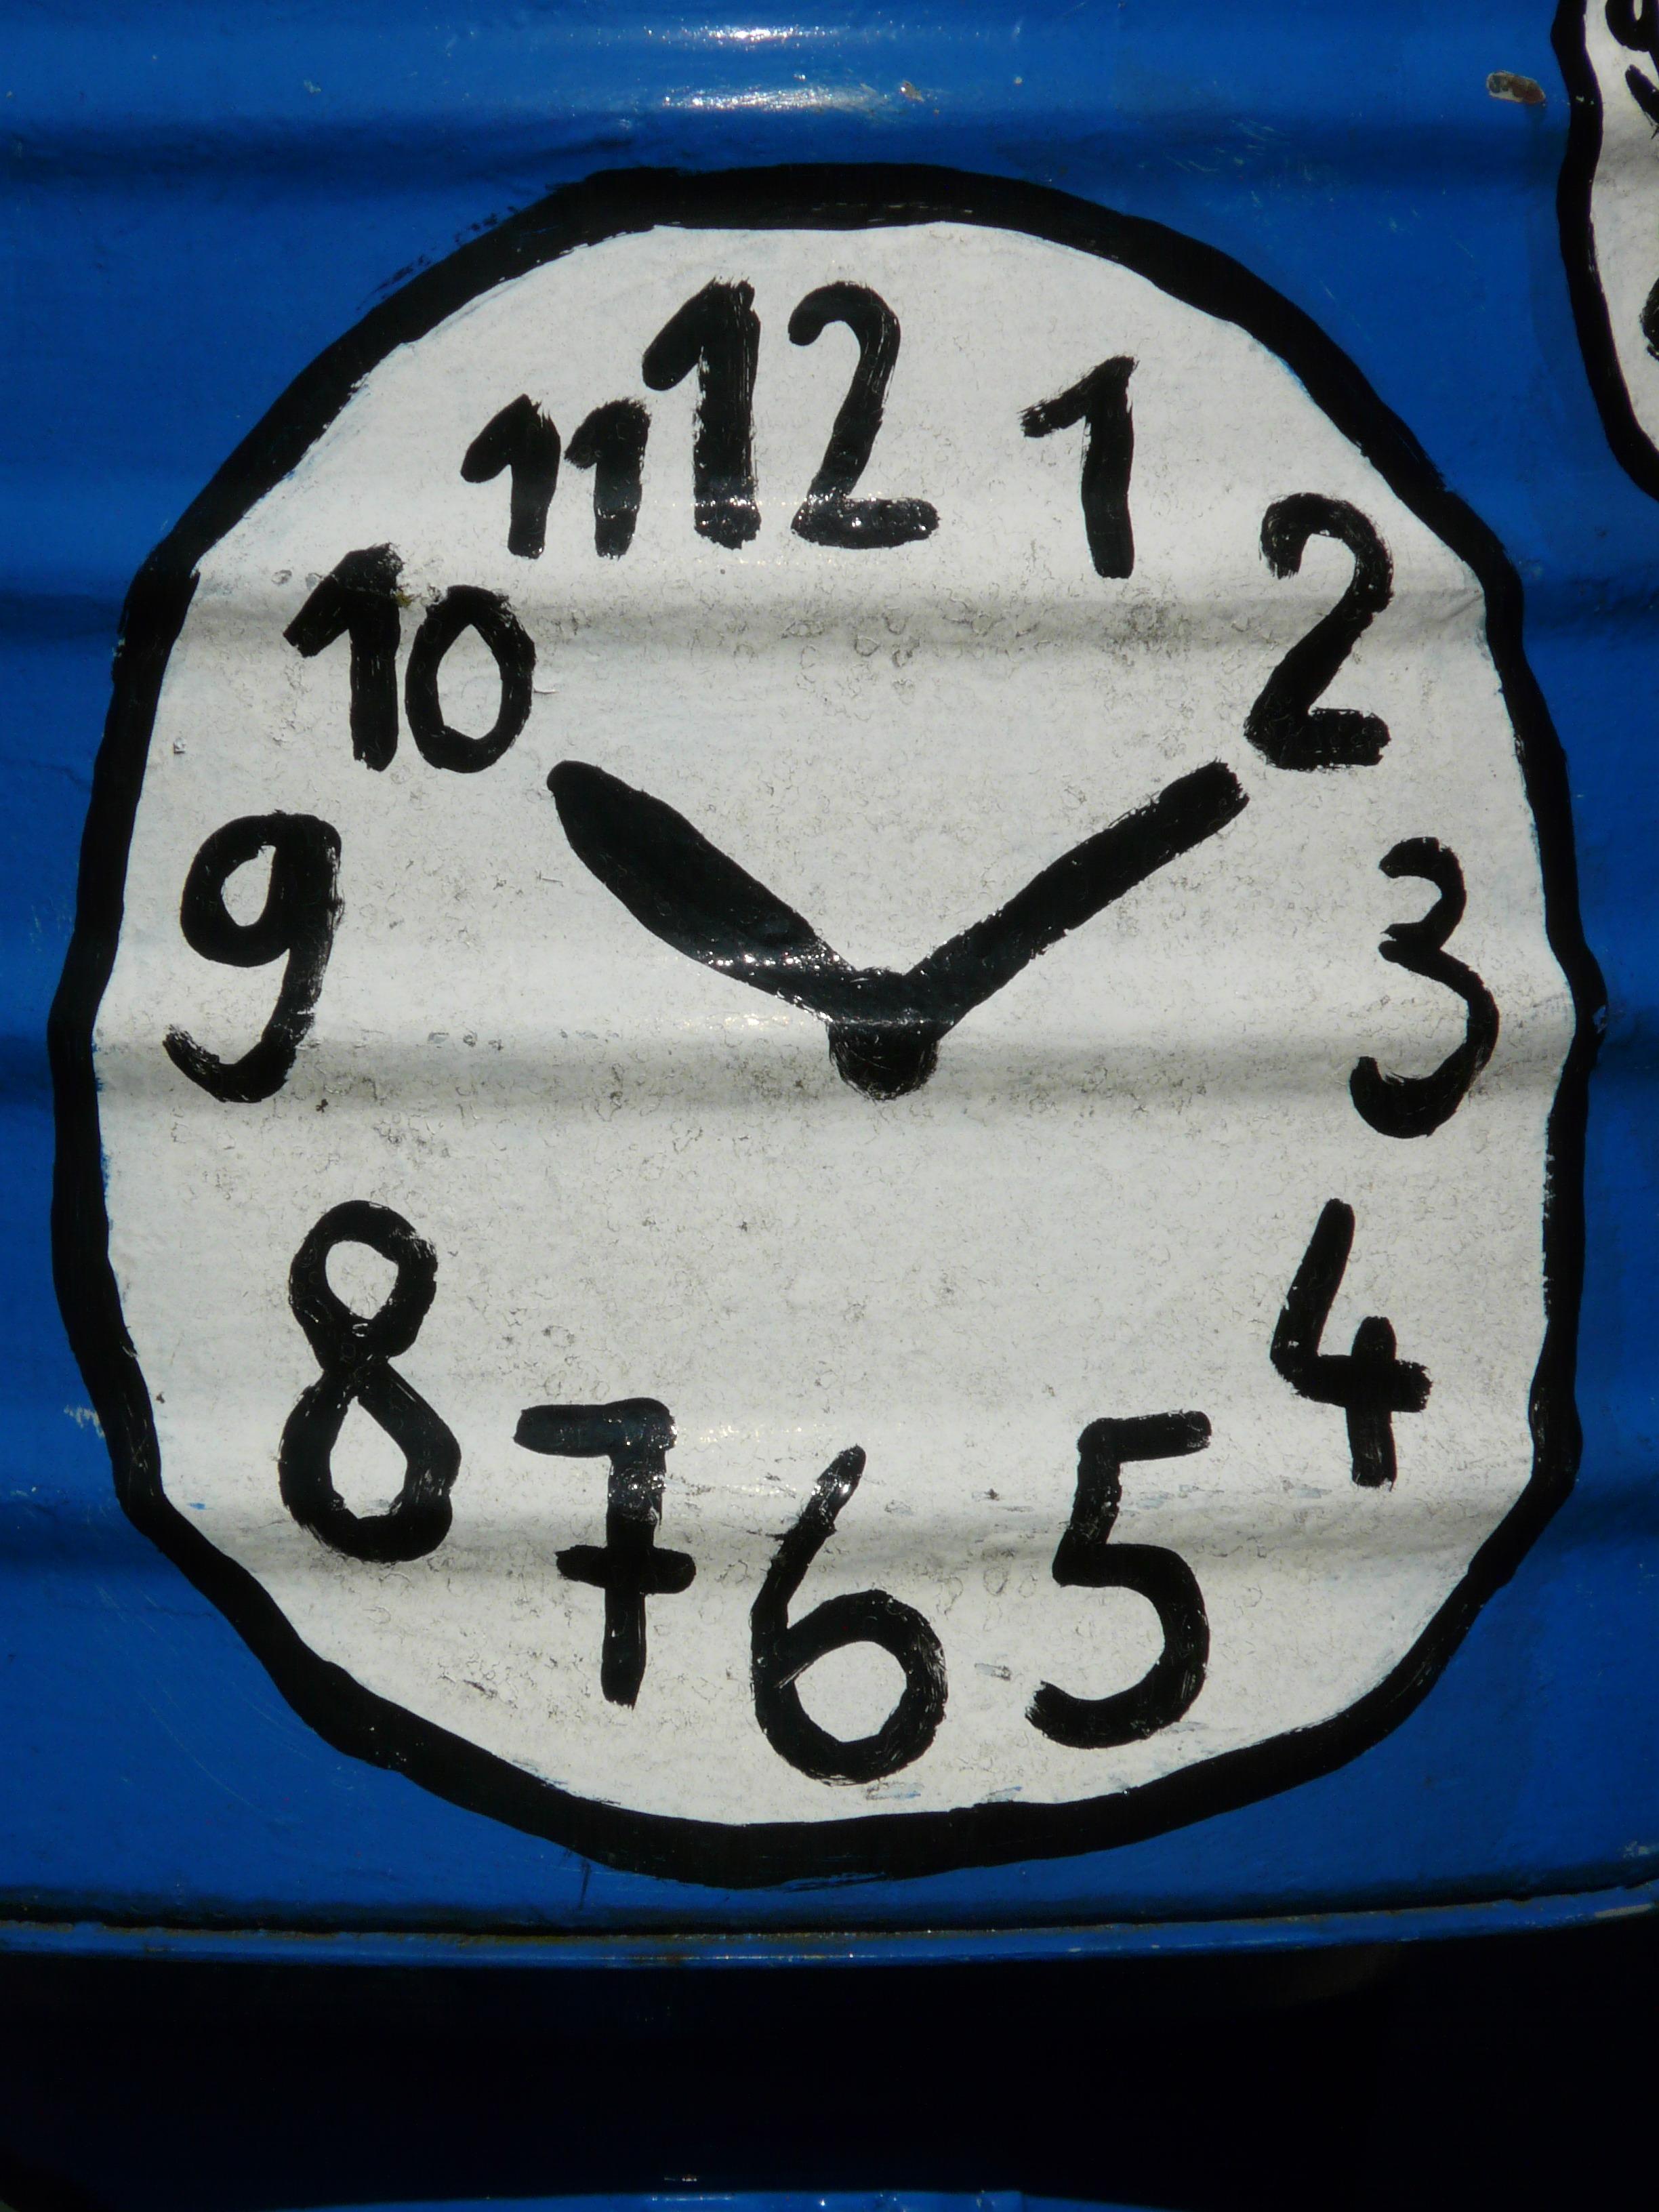 Free Images White Number Symbol Paint Blue Black Dessert